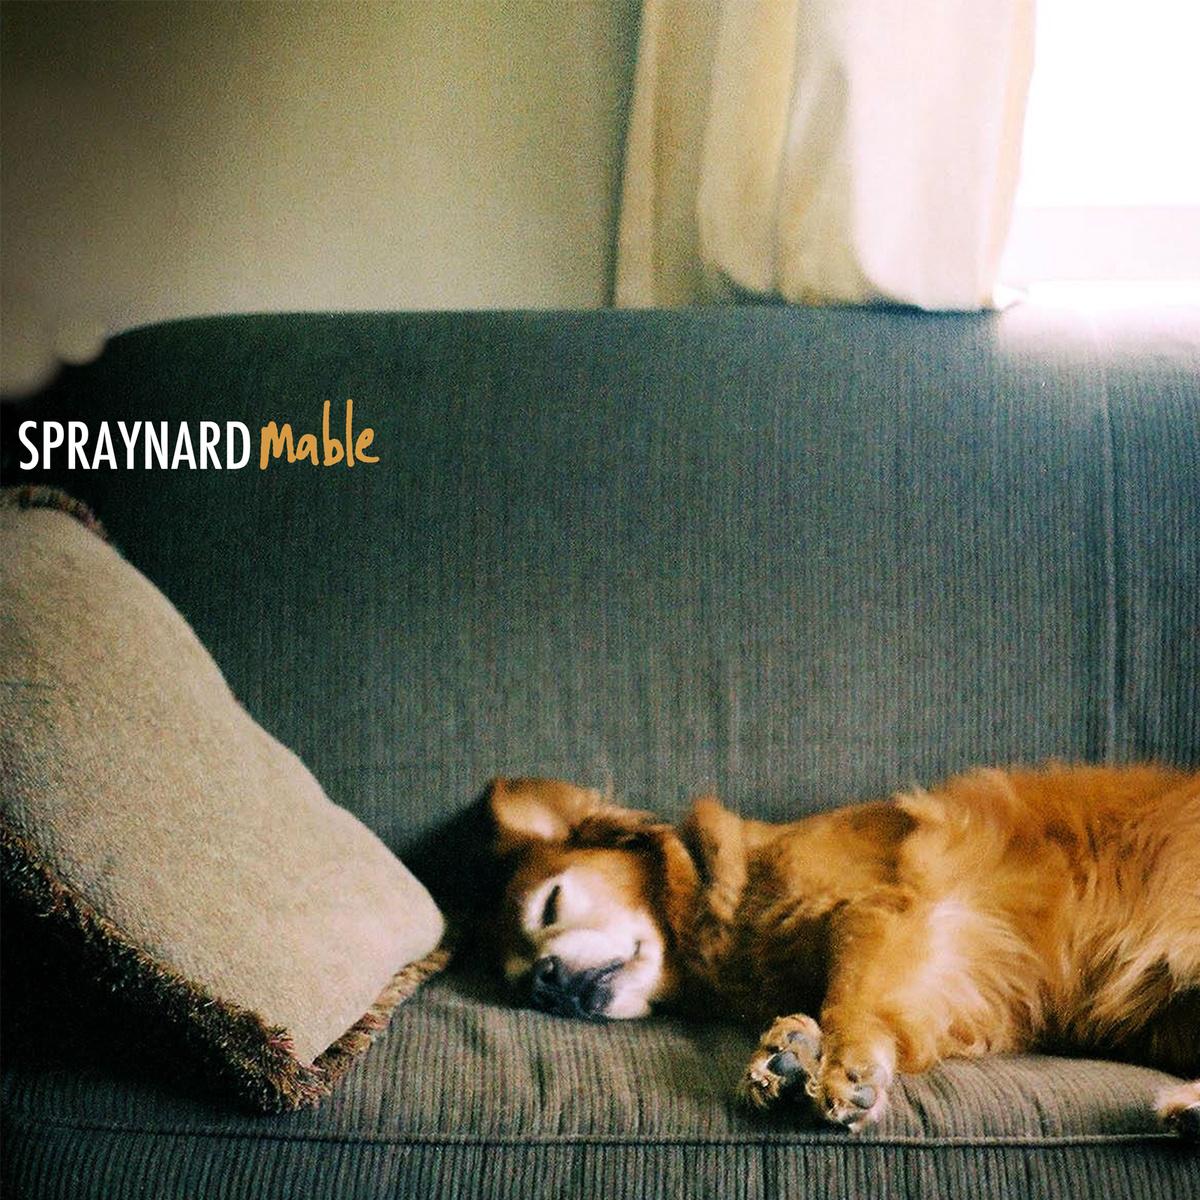 Spraynard - Mable